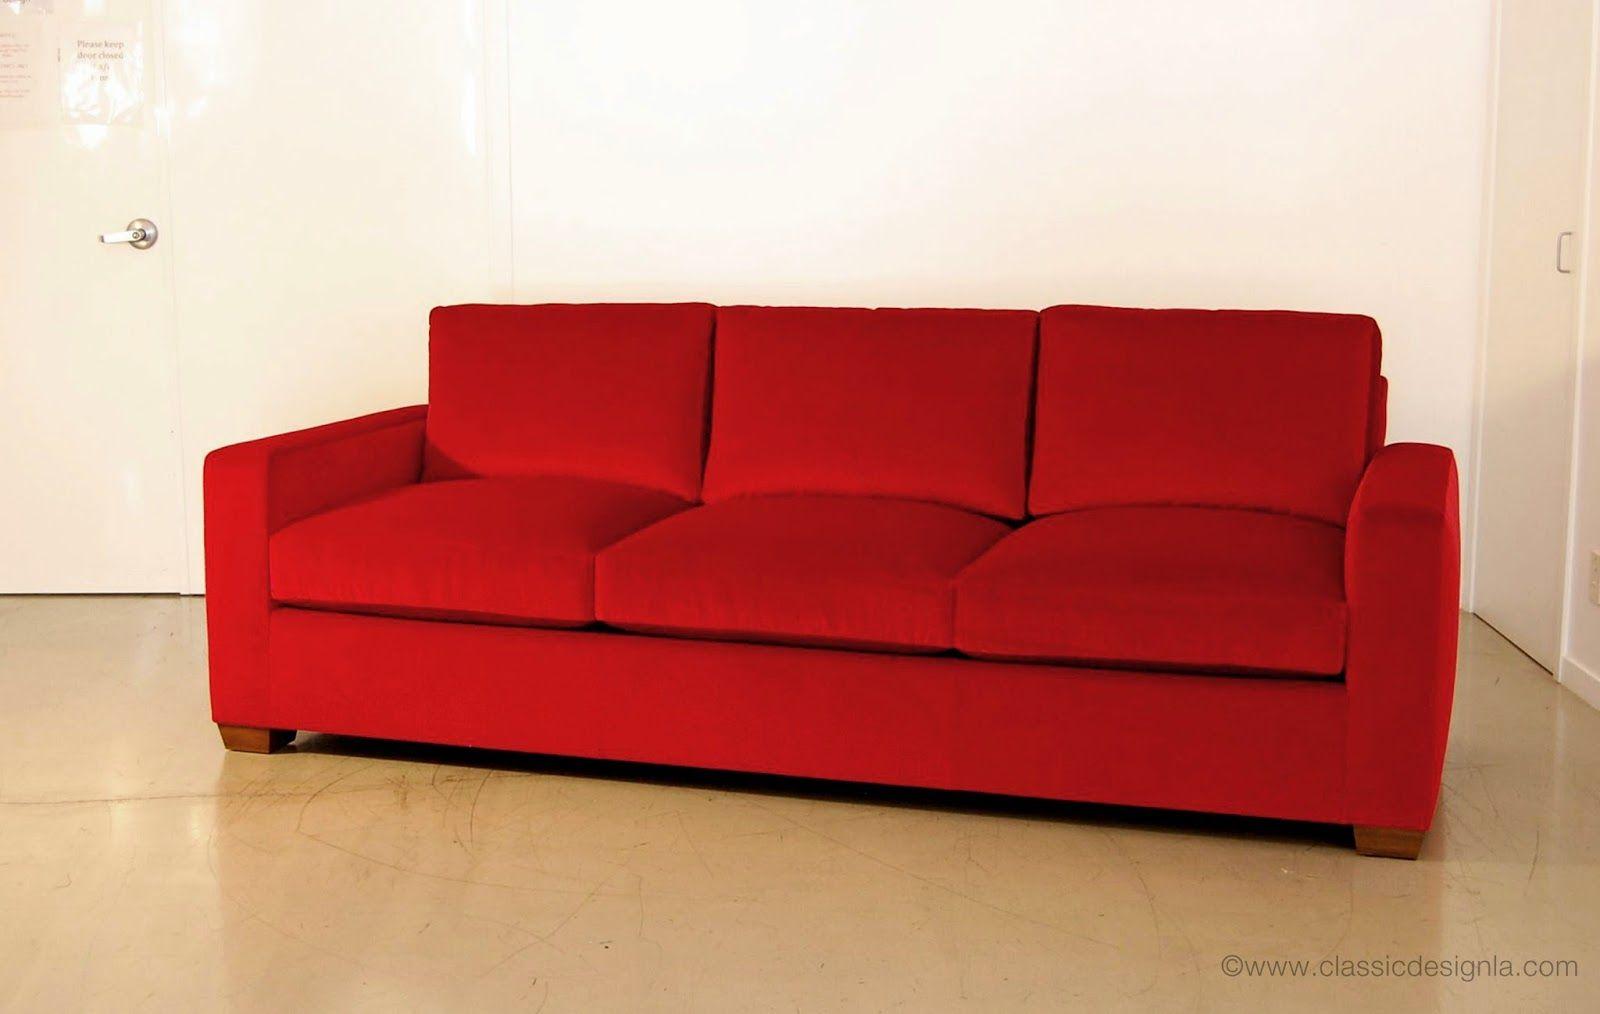 Classic Design: Jean Michel Frank (JMF) Sofa Series